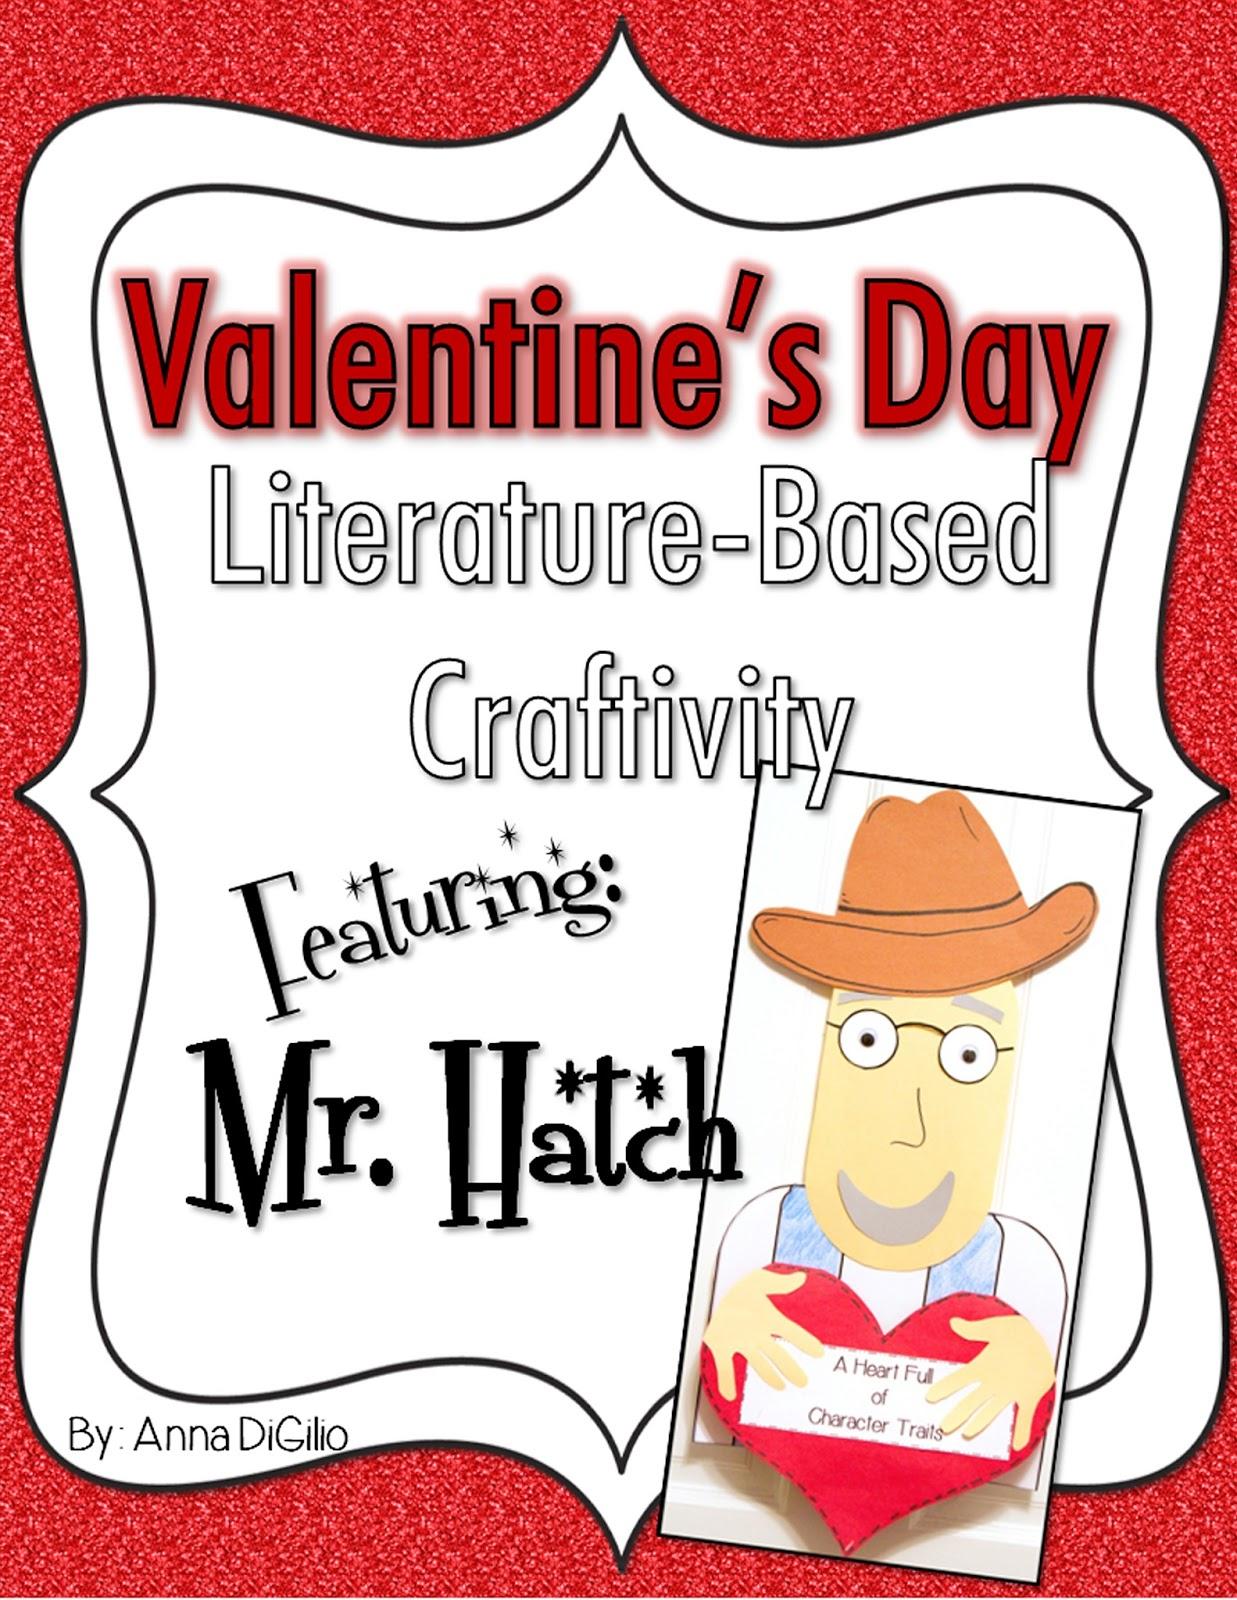 http://www.teacherspayteachers.com/Product/Valentines-Day-Literature-Based-Craftivity-520147